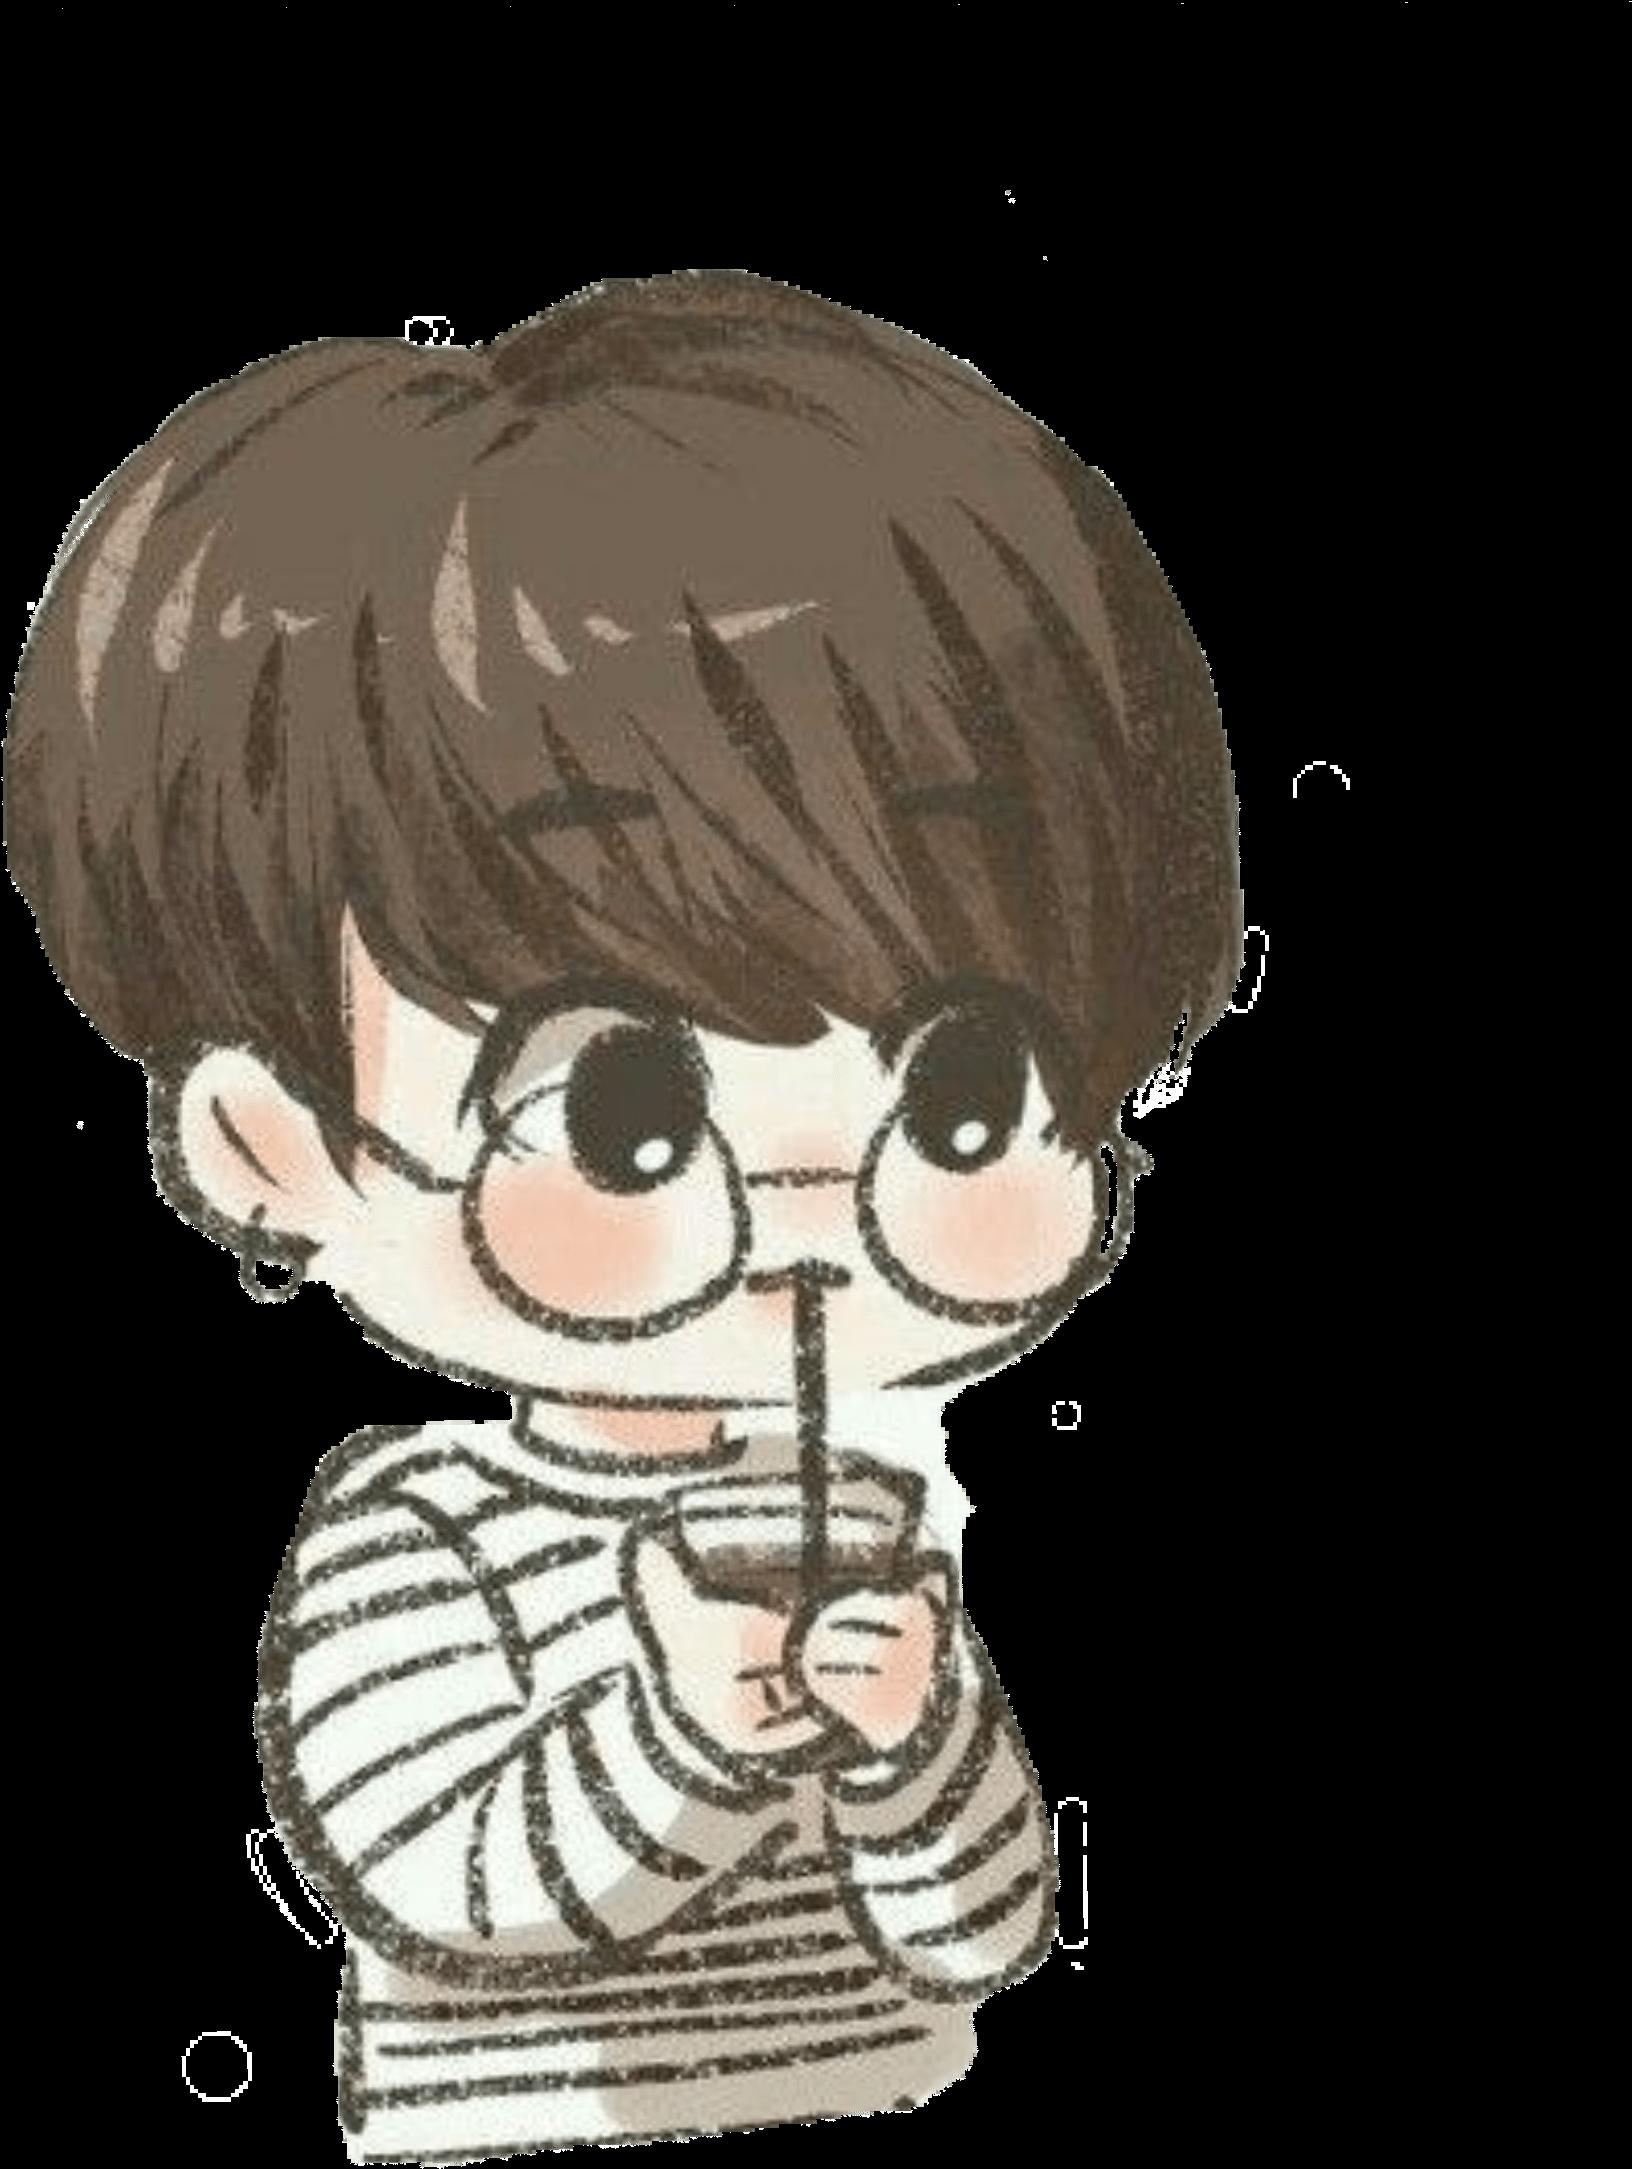 Bts Stickers Png Jungkook Bts Cute Chibi Bts Chibi Drawing